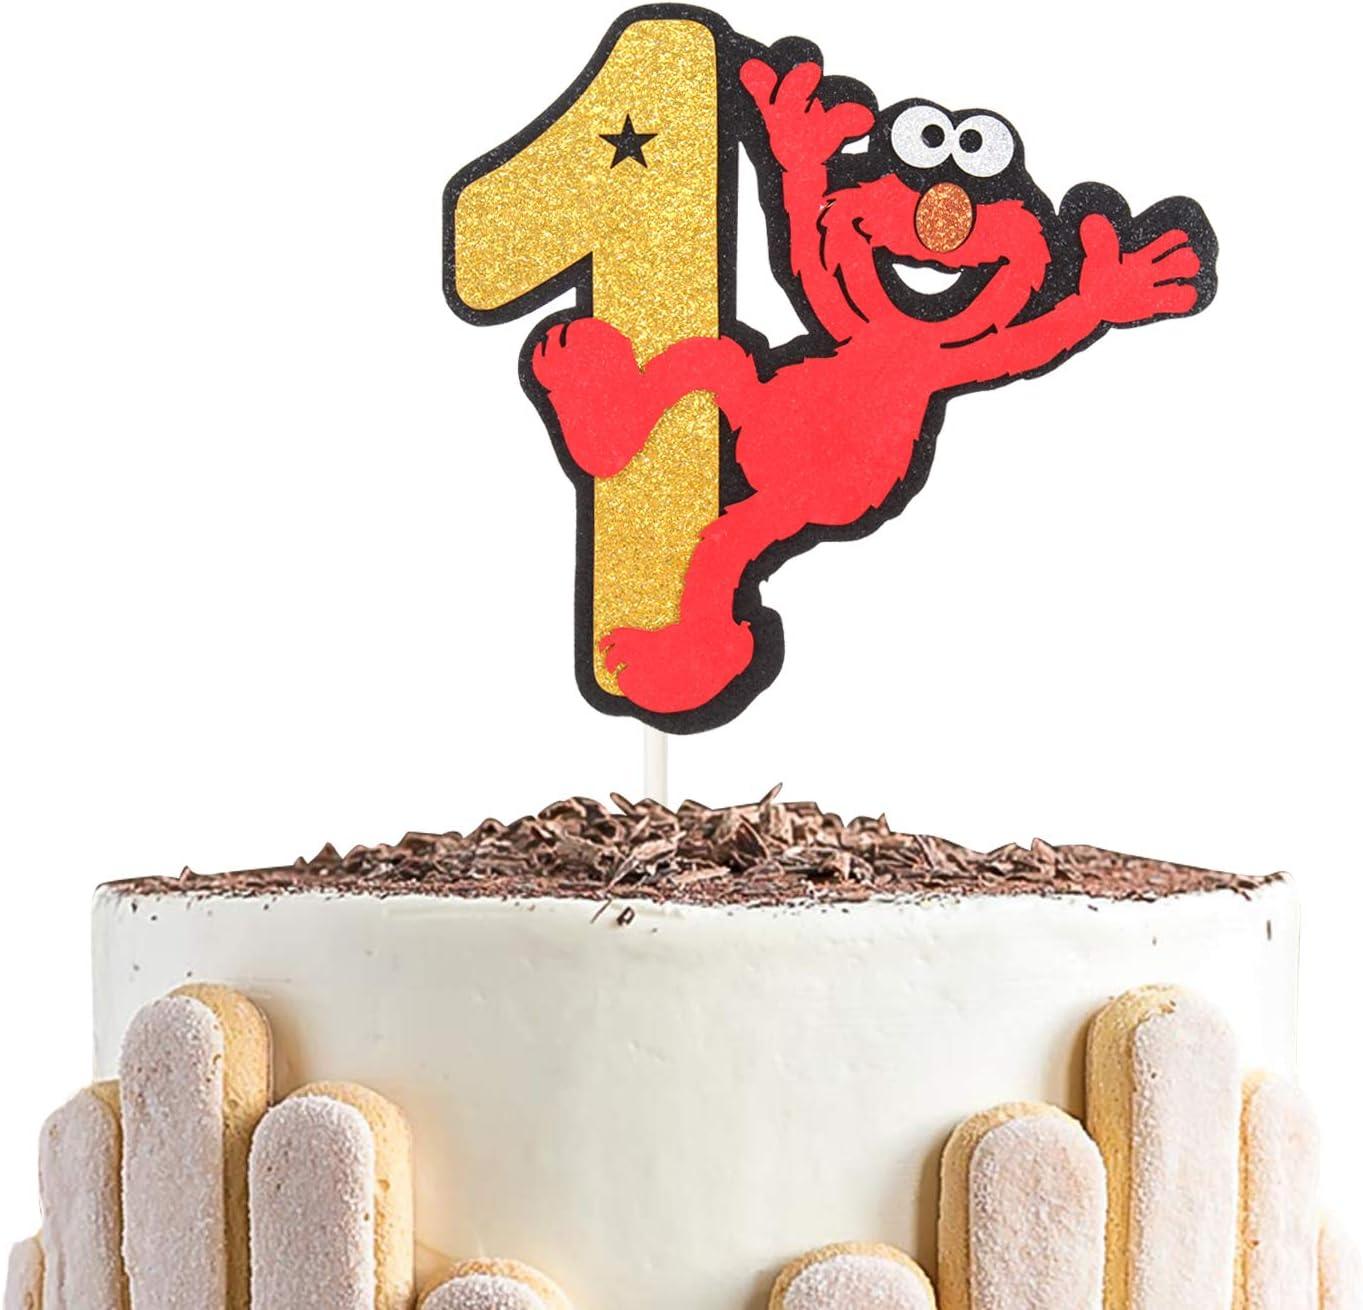 Marvelous Amazon Com Babys 1St Birthday Cake Topper Elmo For Kids Funny Birthday Cards Online Bapapcheapnameinfo